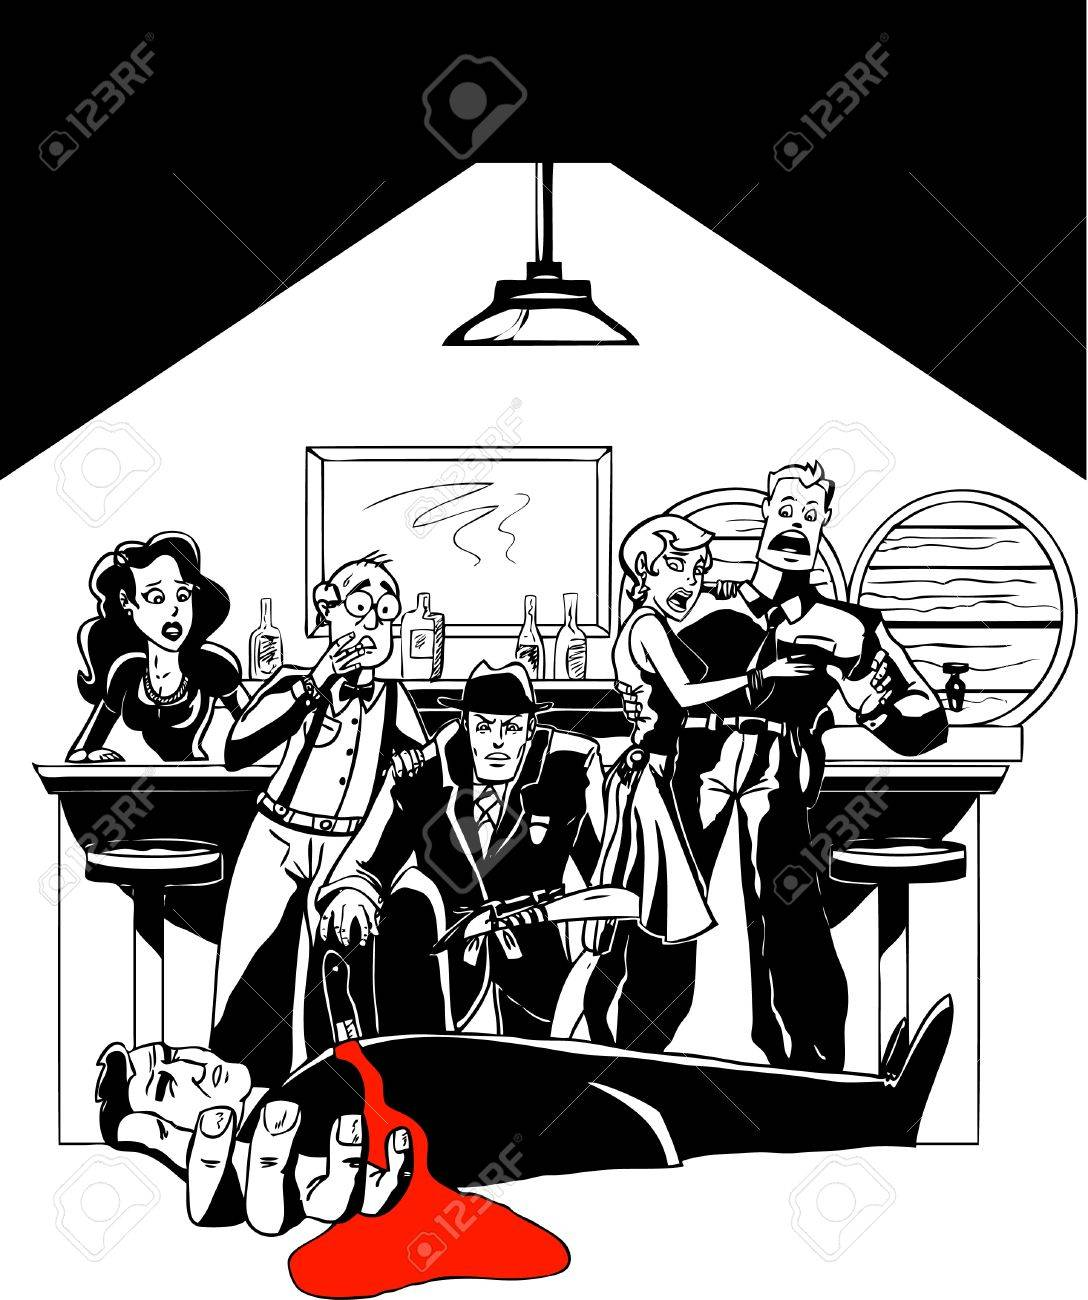 Murder Mystery at the Speakeasy - 20294269